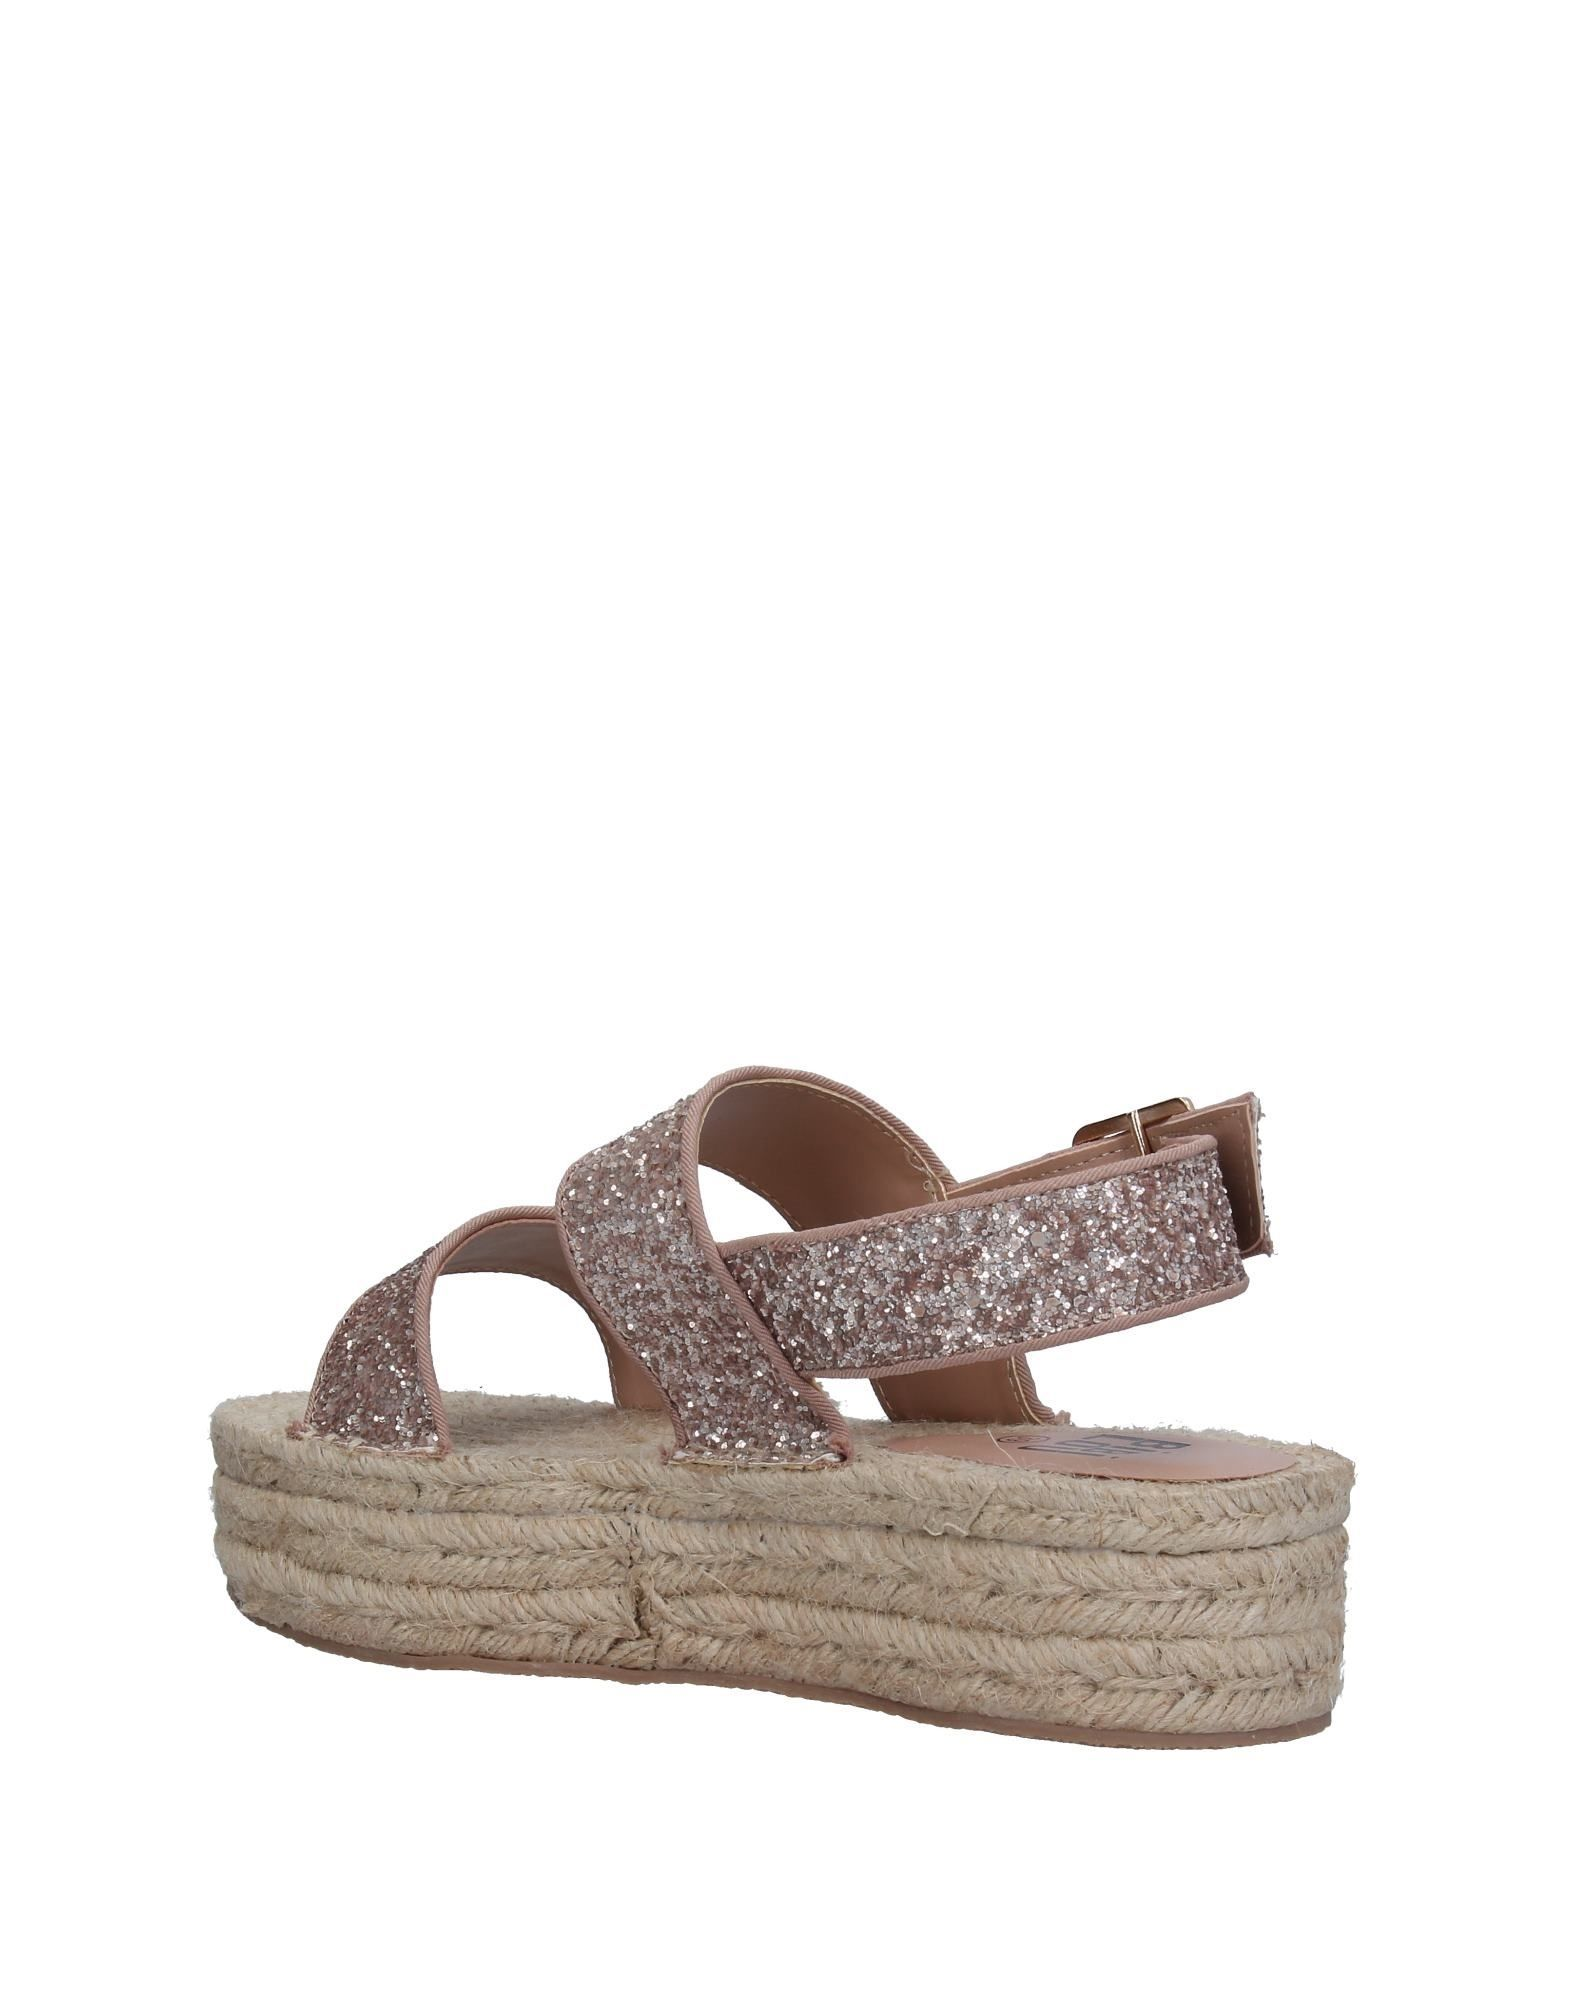 Bibi Lou Pale Pink Espadrille Sandals